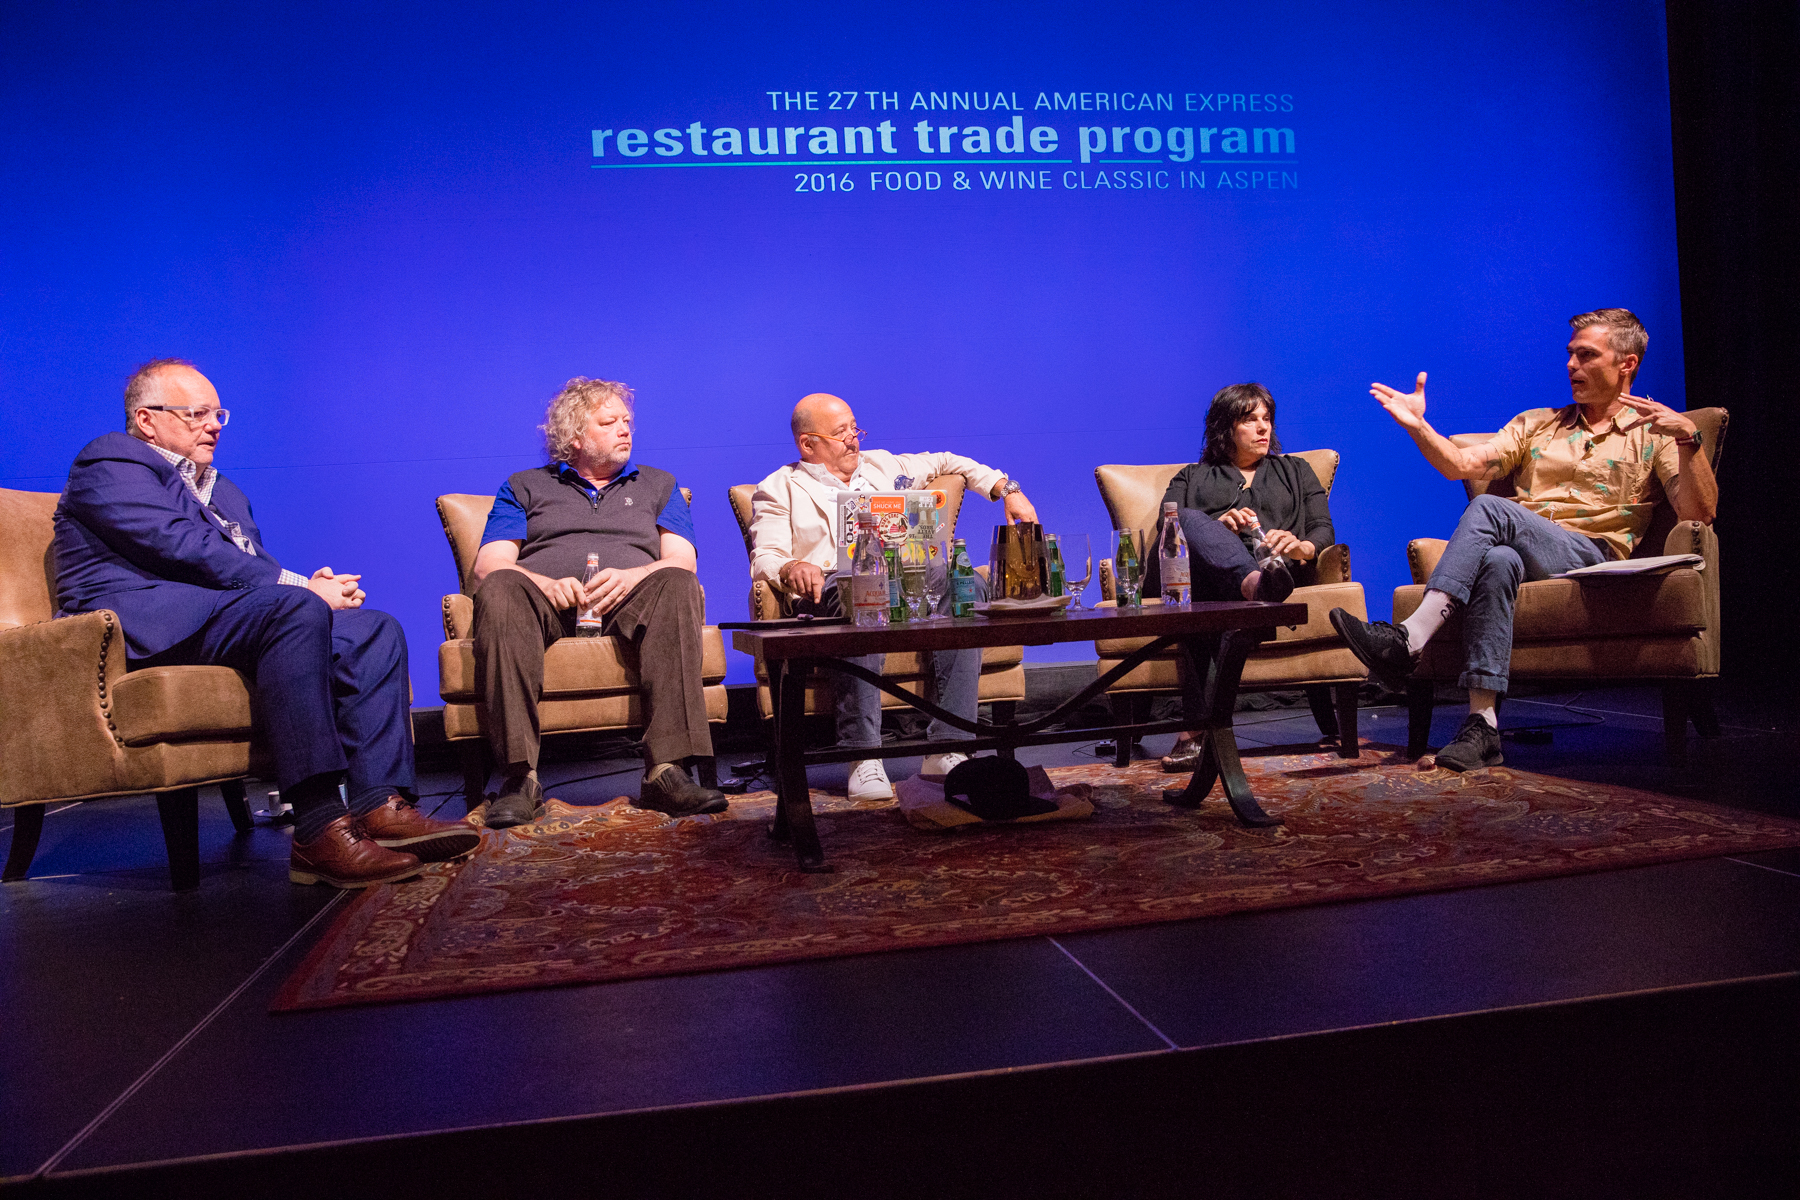 American Express Restaurant Trade Program, June 17